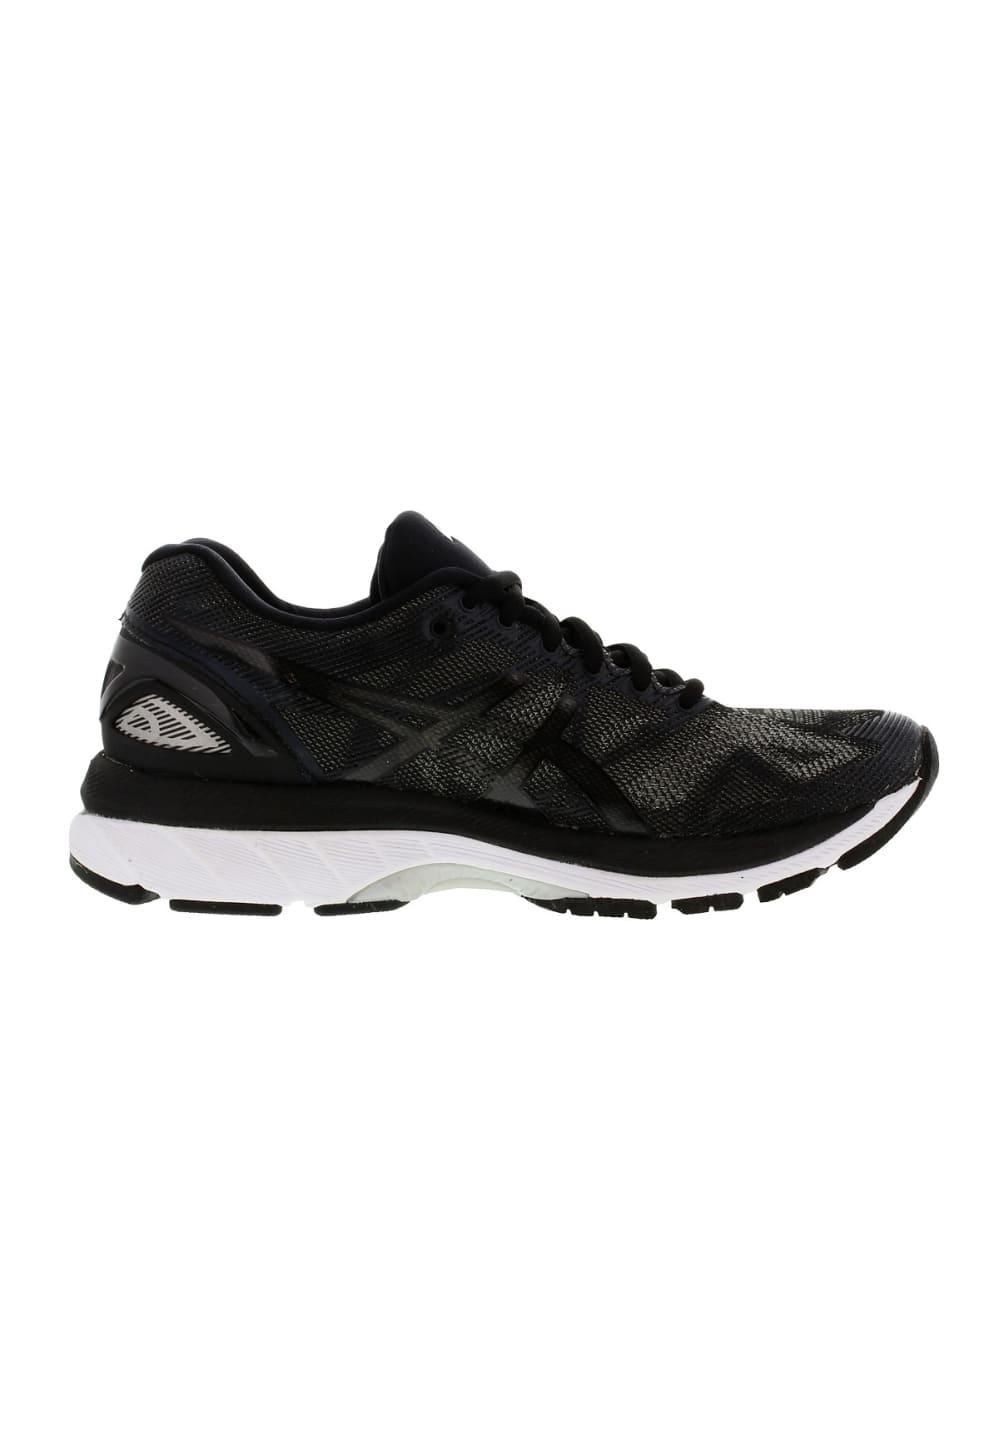 Asics Pour 19 Gel Chaussures Nimbus Noir Running Femme NyOv8n0mw